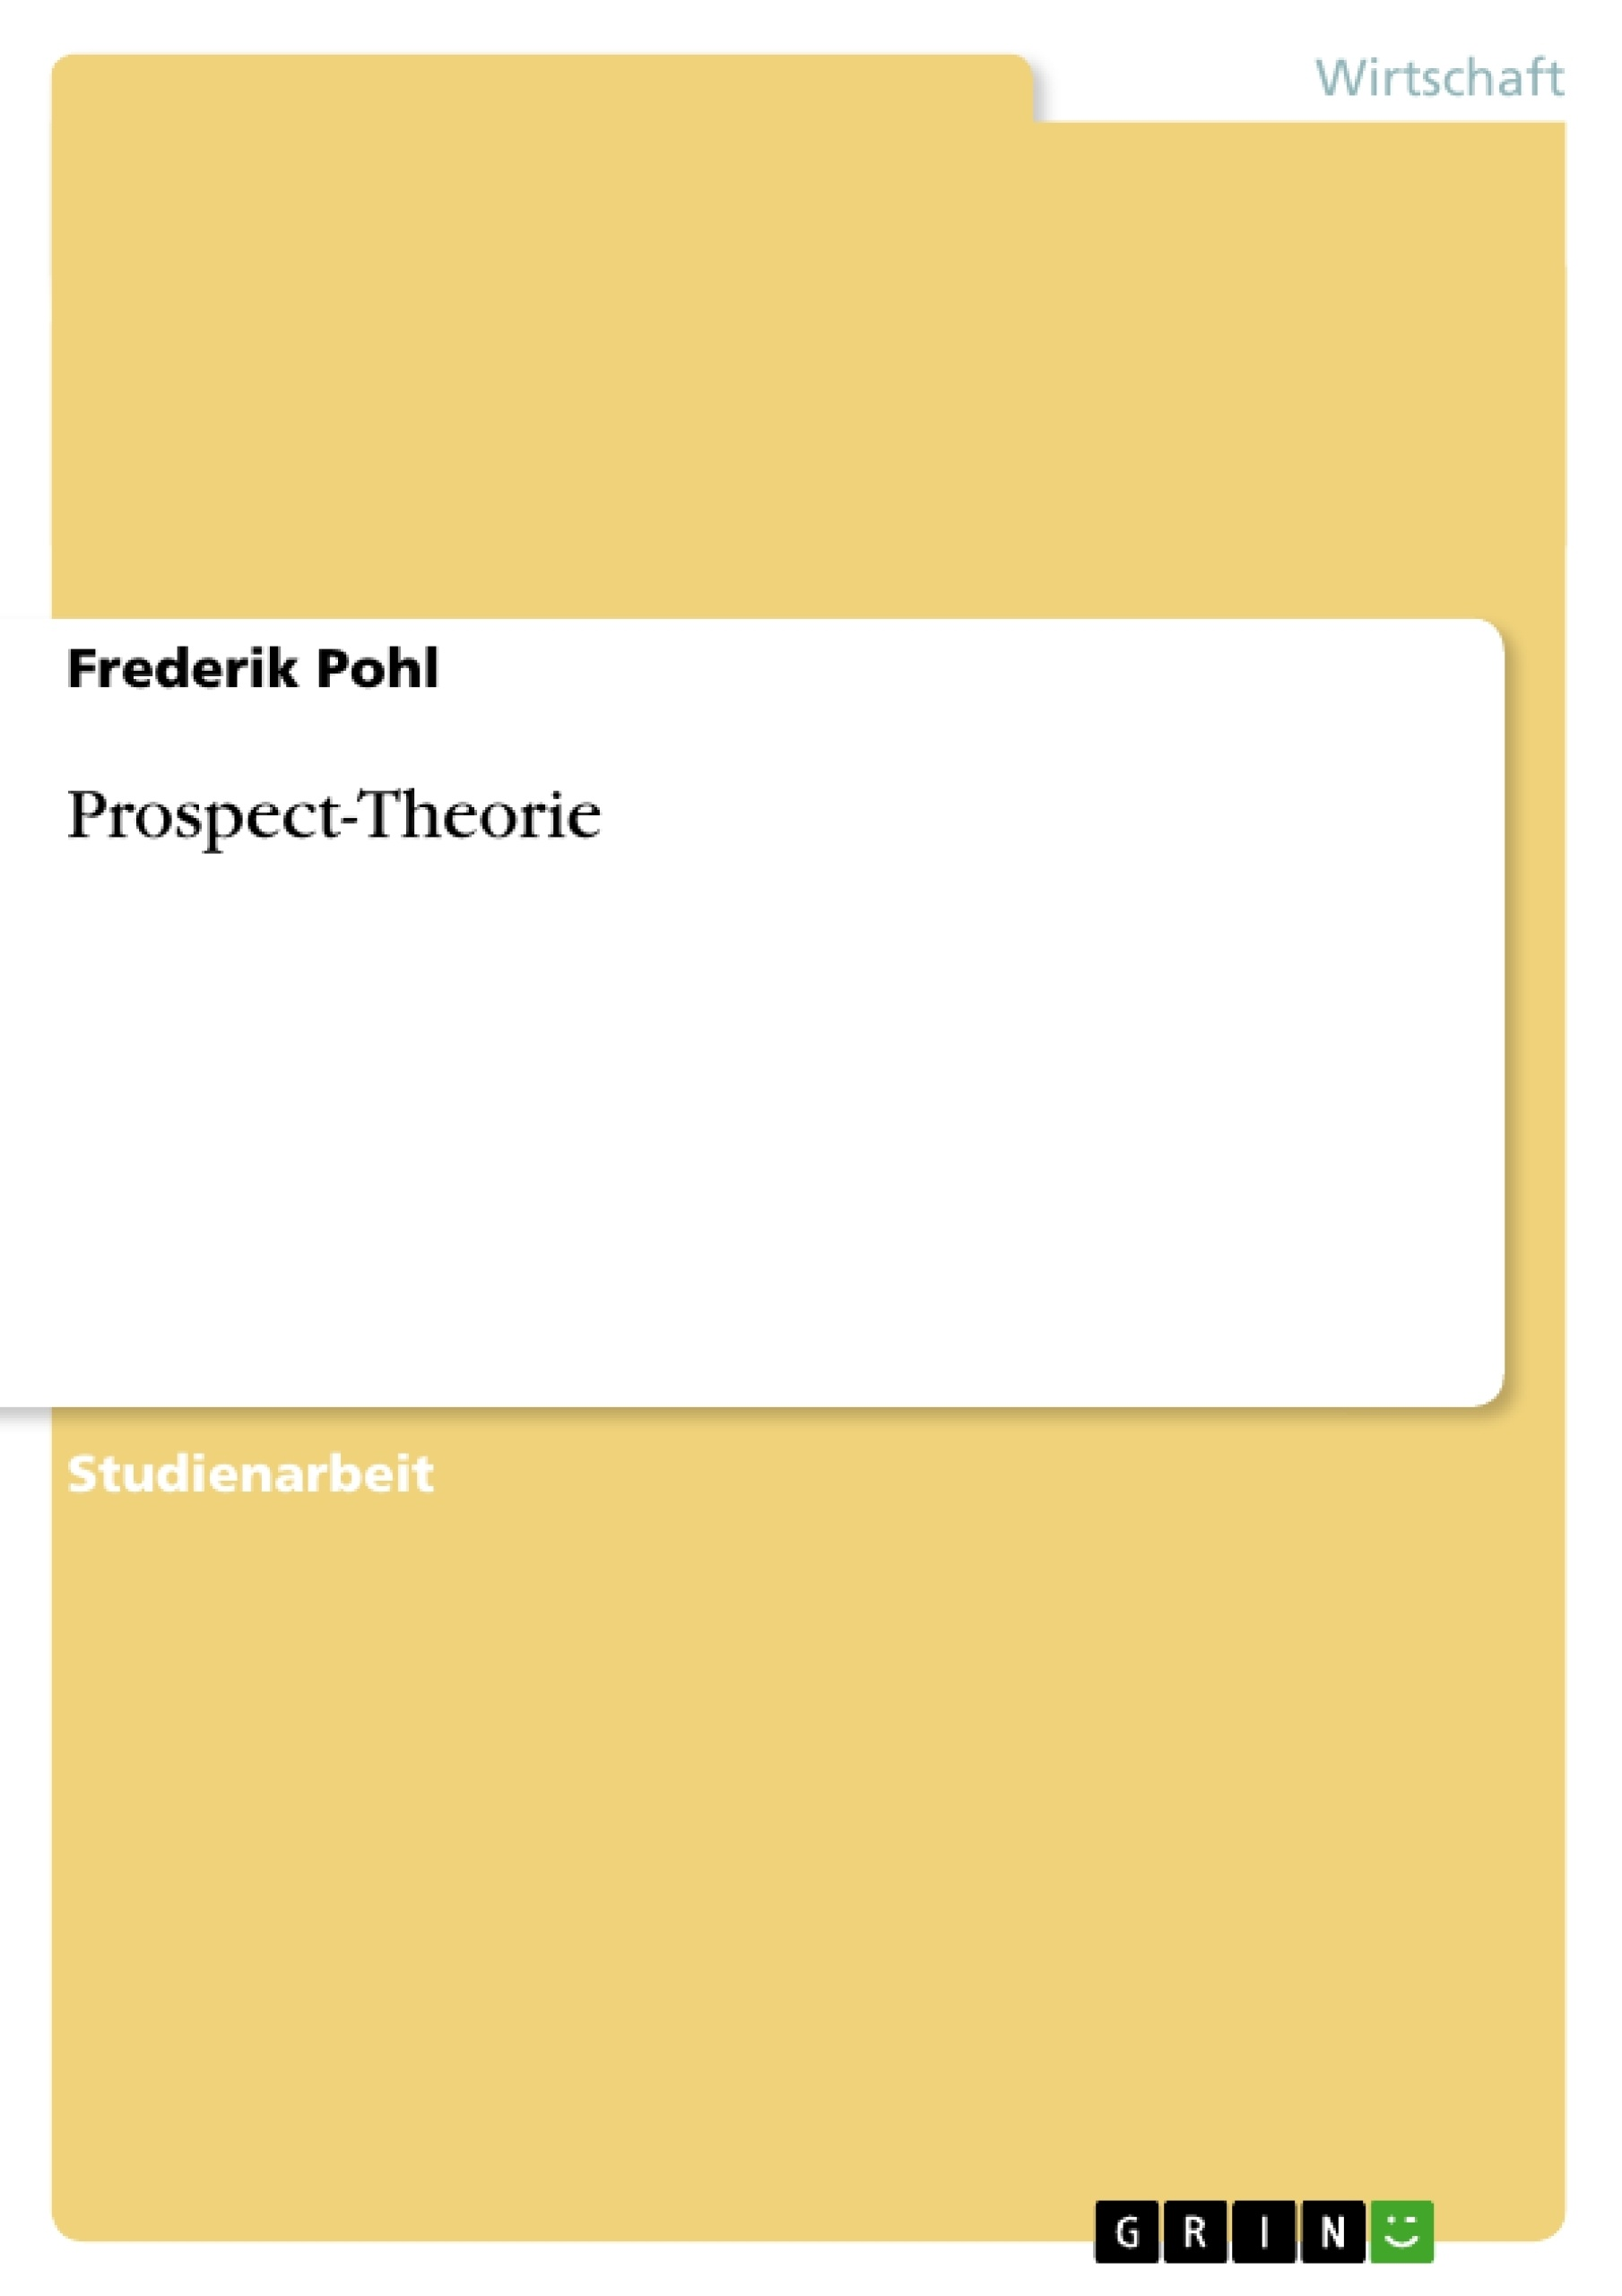 Titel: Prospect-Theorie